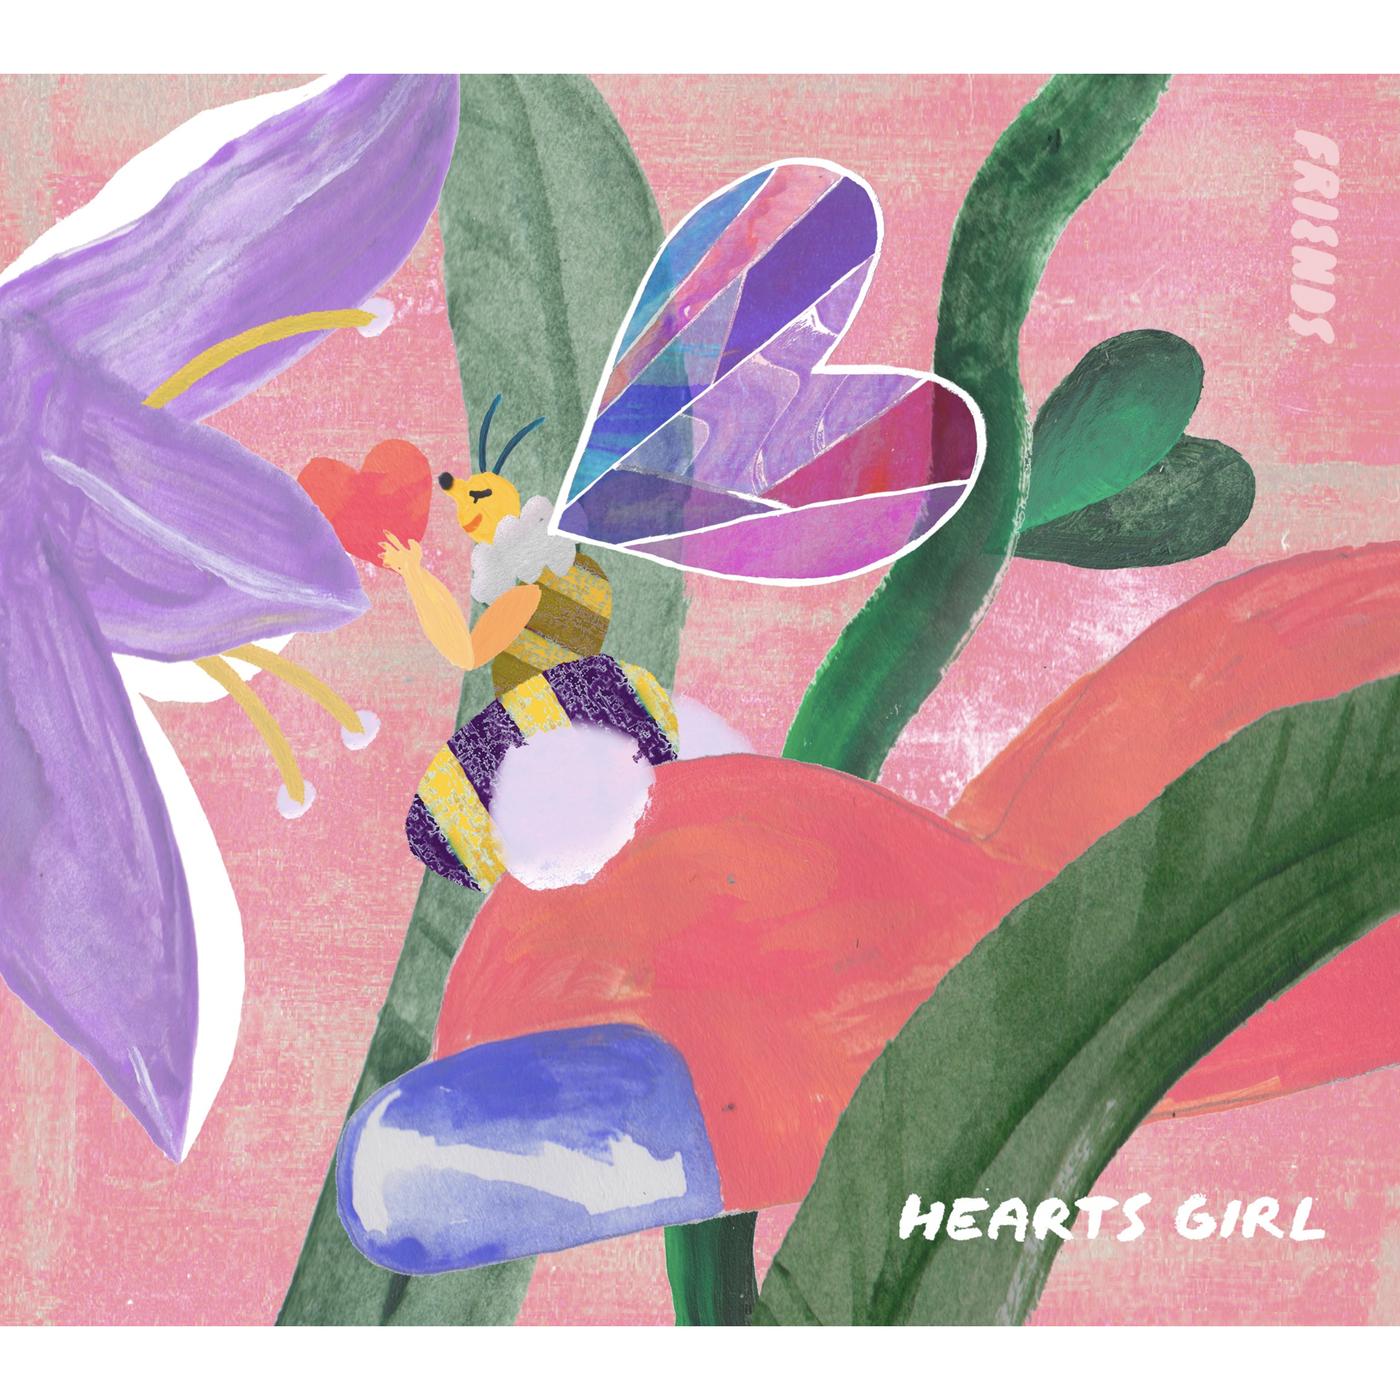 HEARTS GIRL - Friends